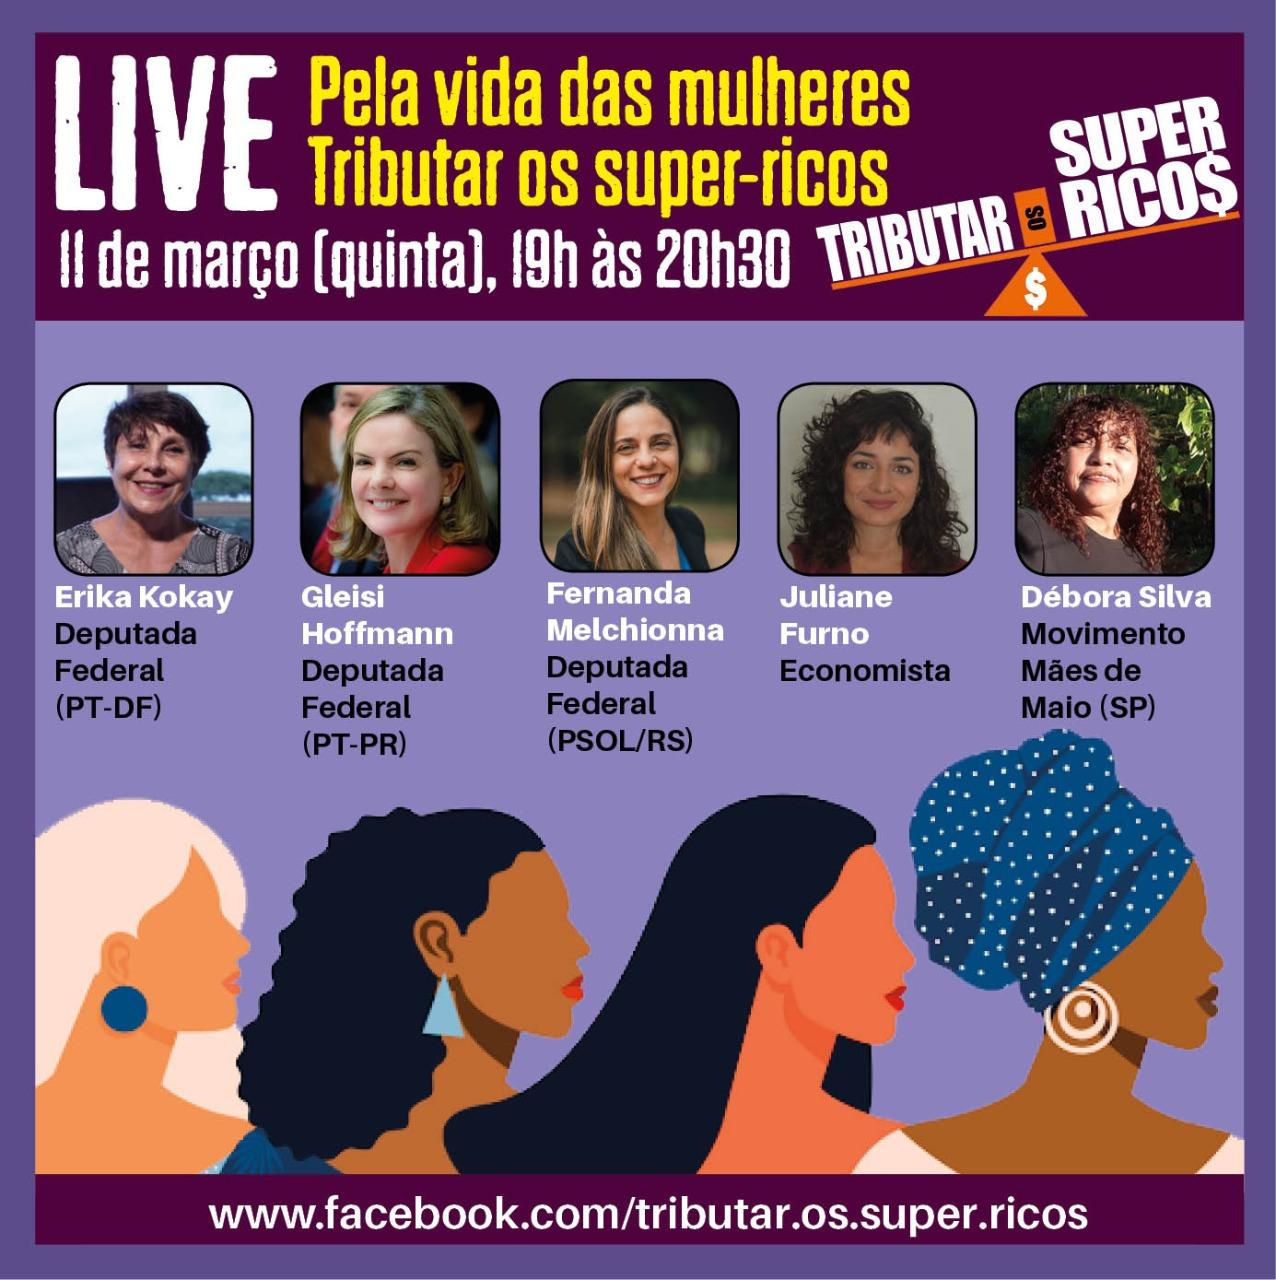 2021 03 05 live pela vida mulheres tributar